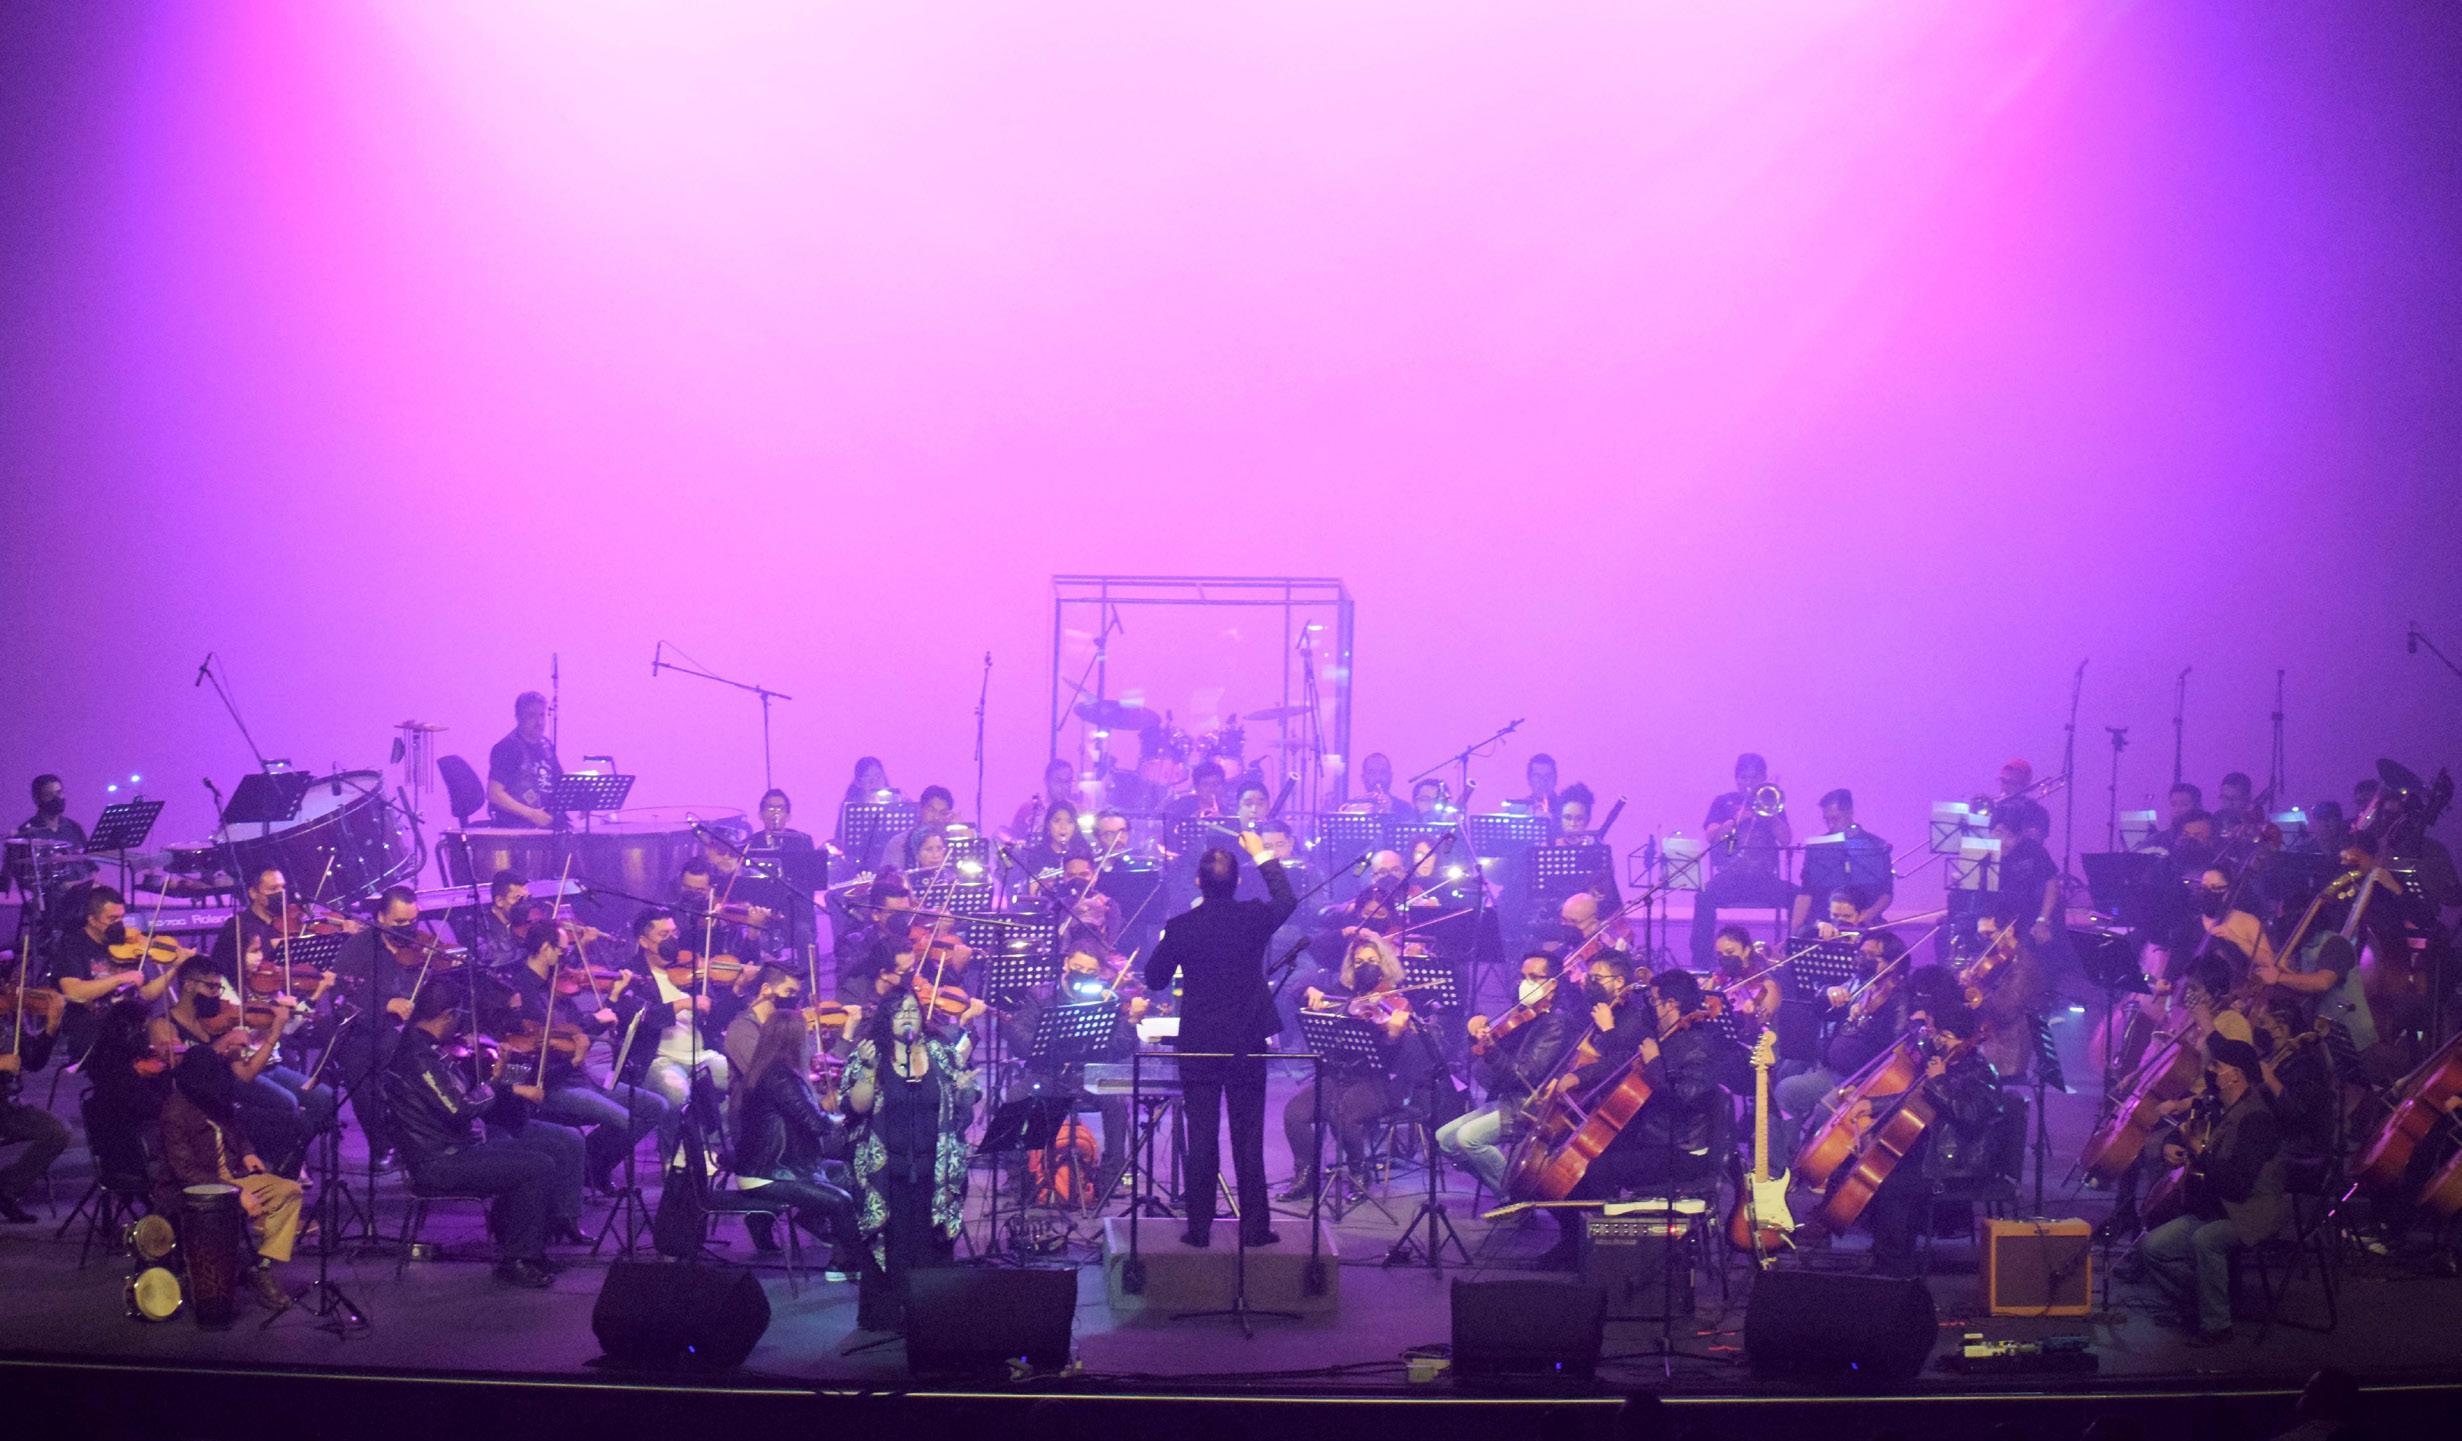 Page 50 of Orquesta Filarmónica de Toluca, Renacer con Chauvet Professional